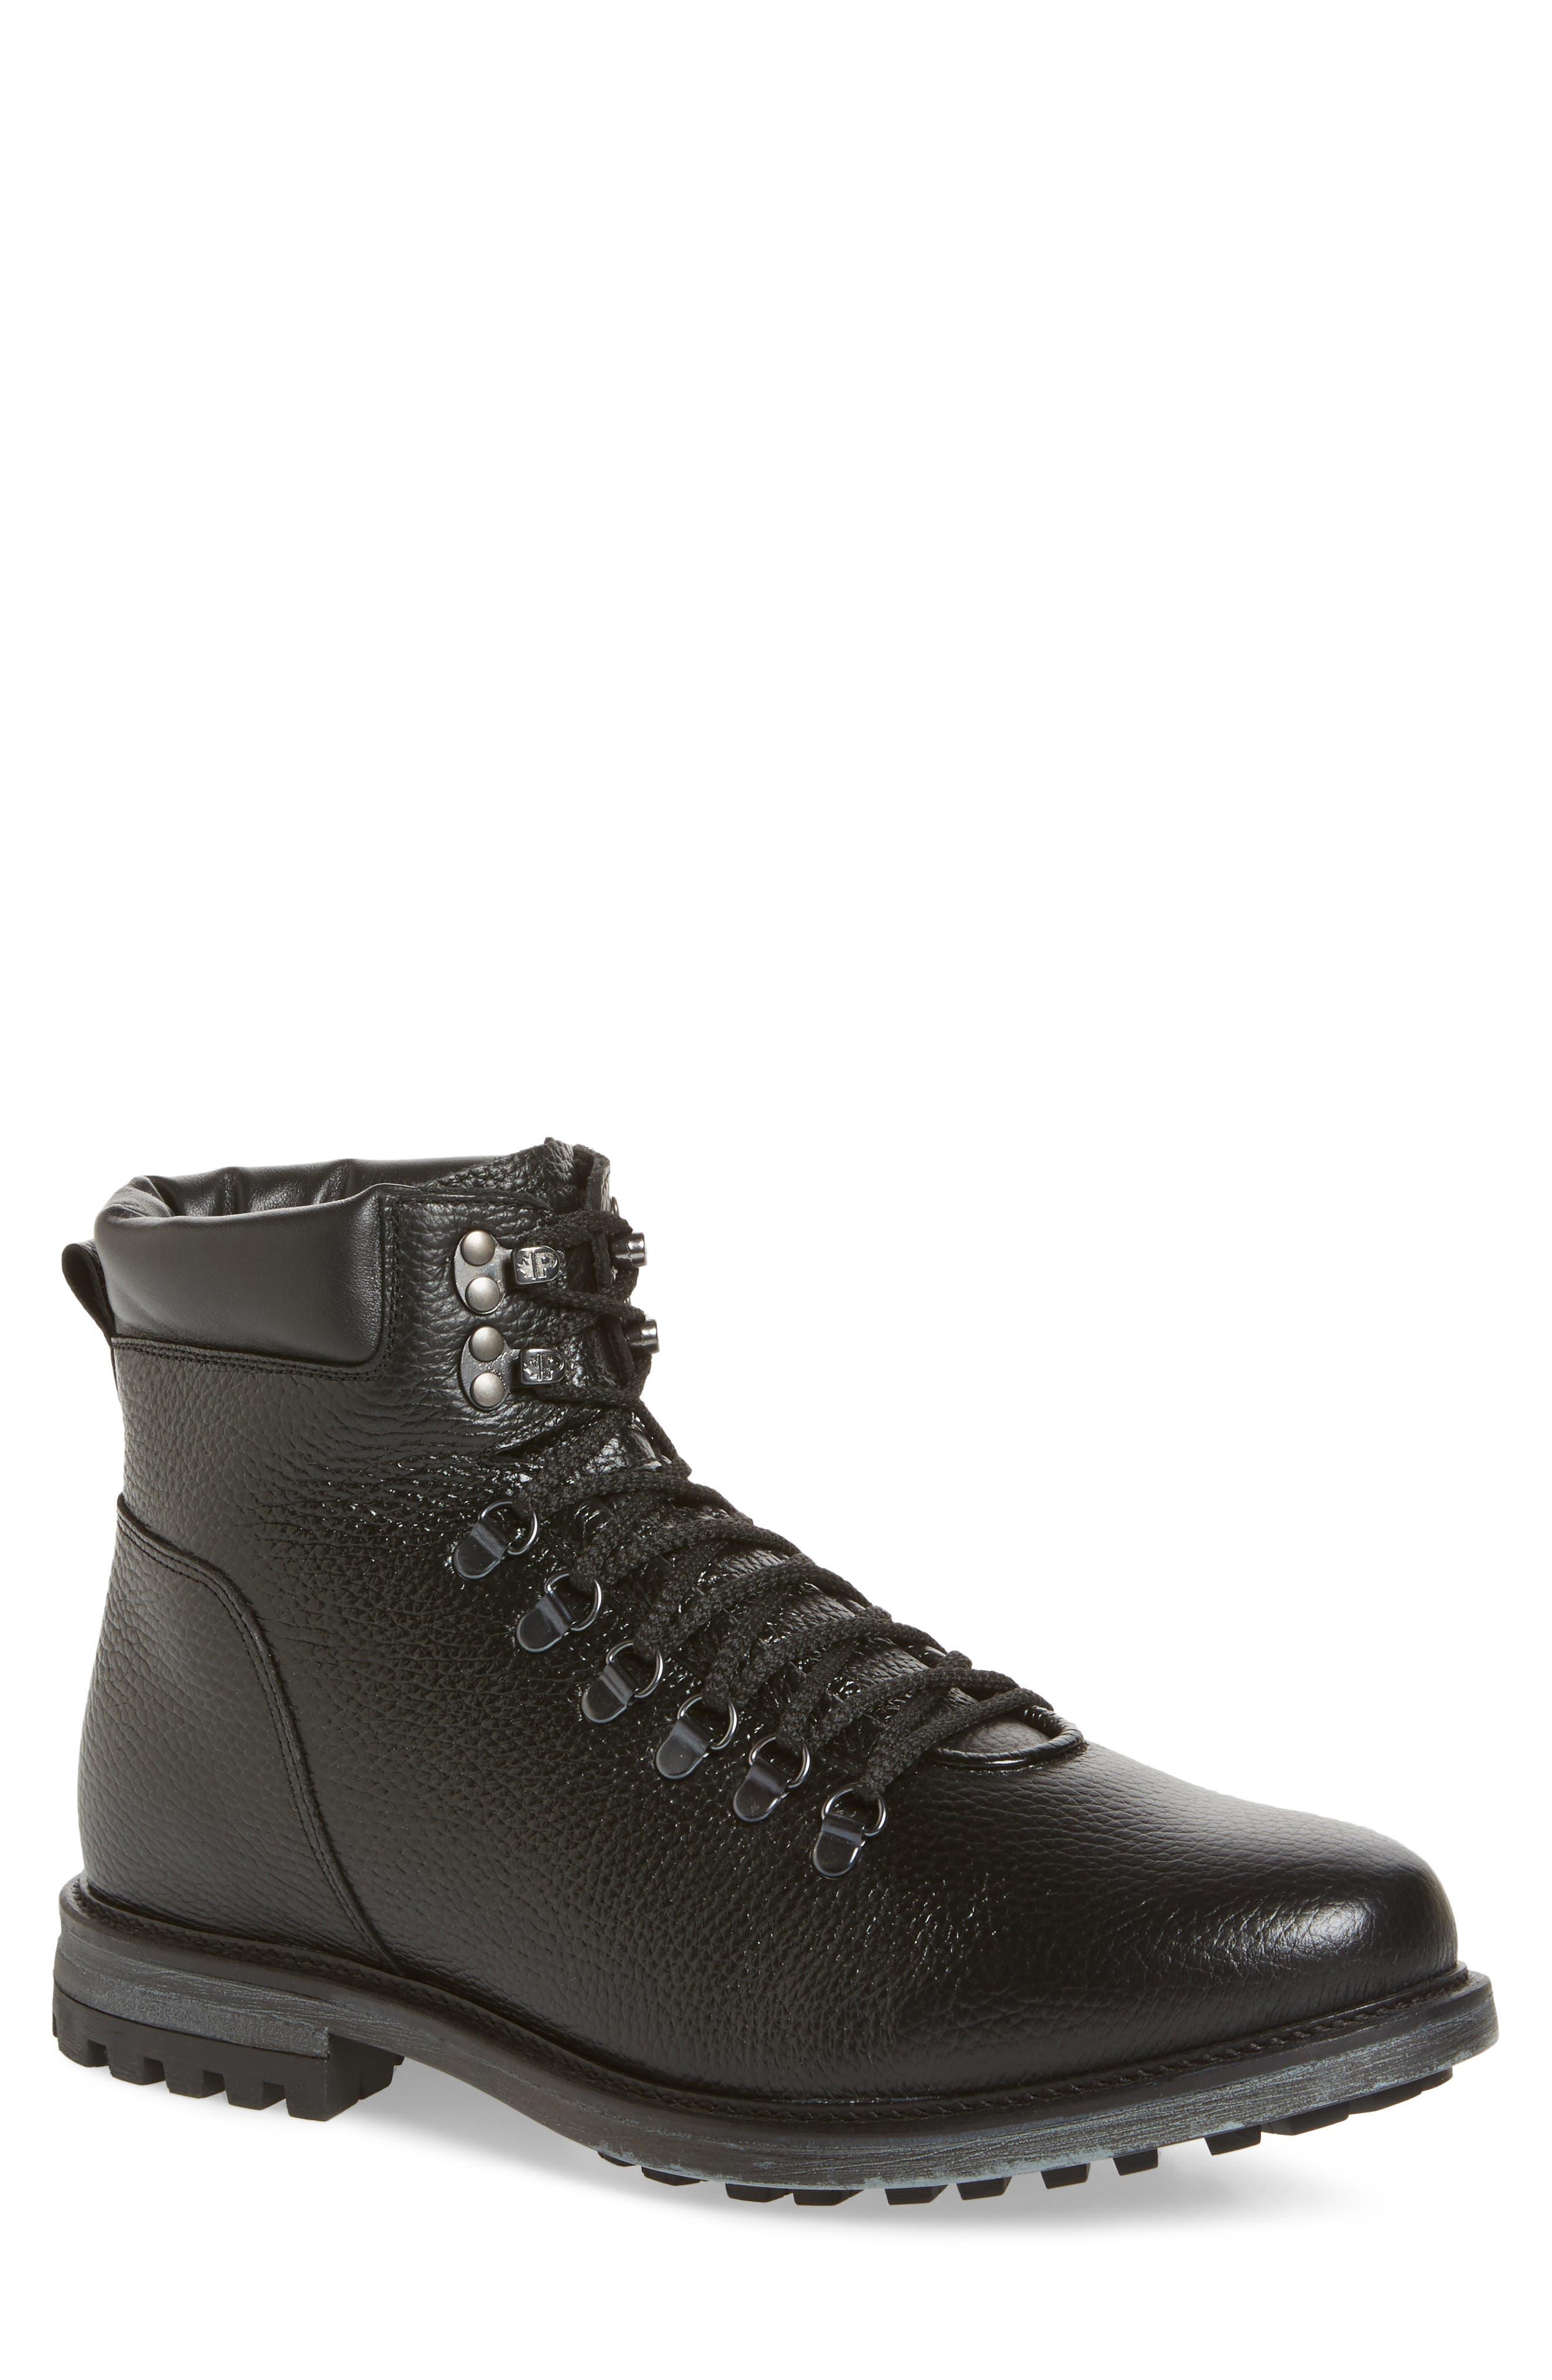 Venice Genuine Shearling Lined Plain Toe Boot,                             Main thumbnail 1, color,                             BLACK LEATHER